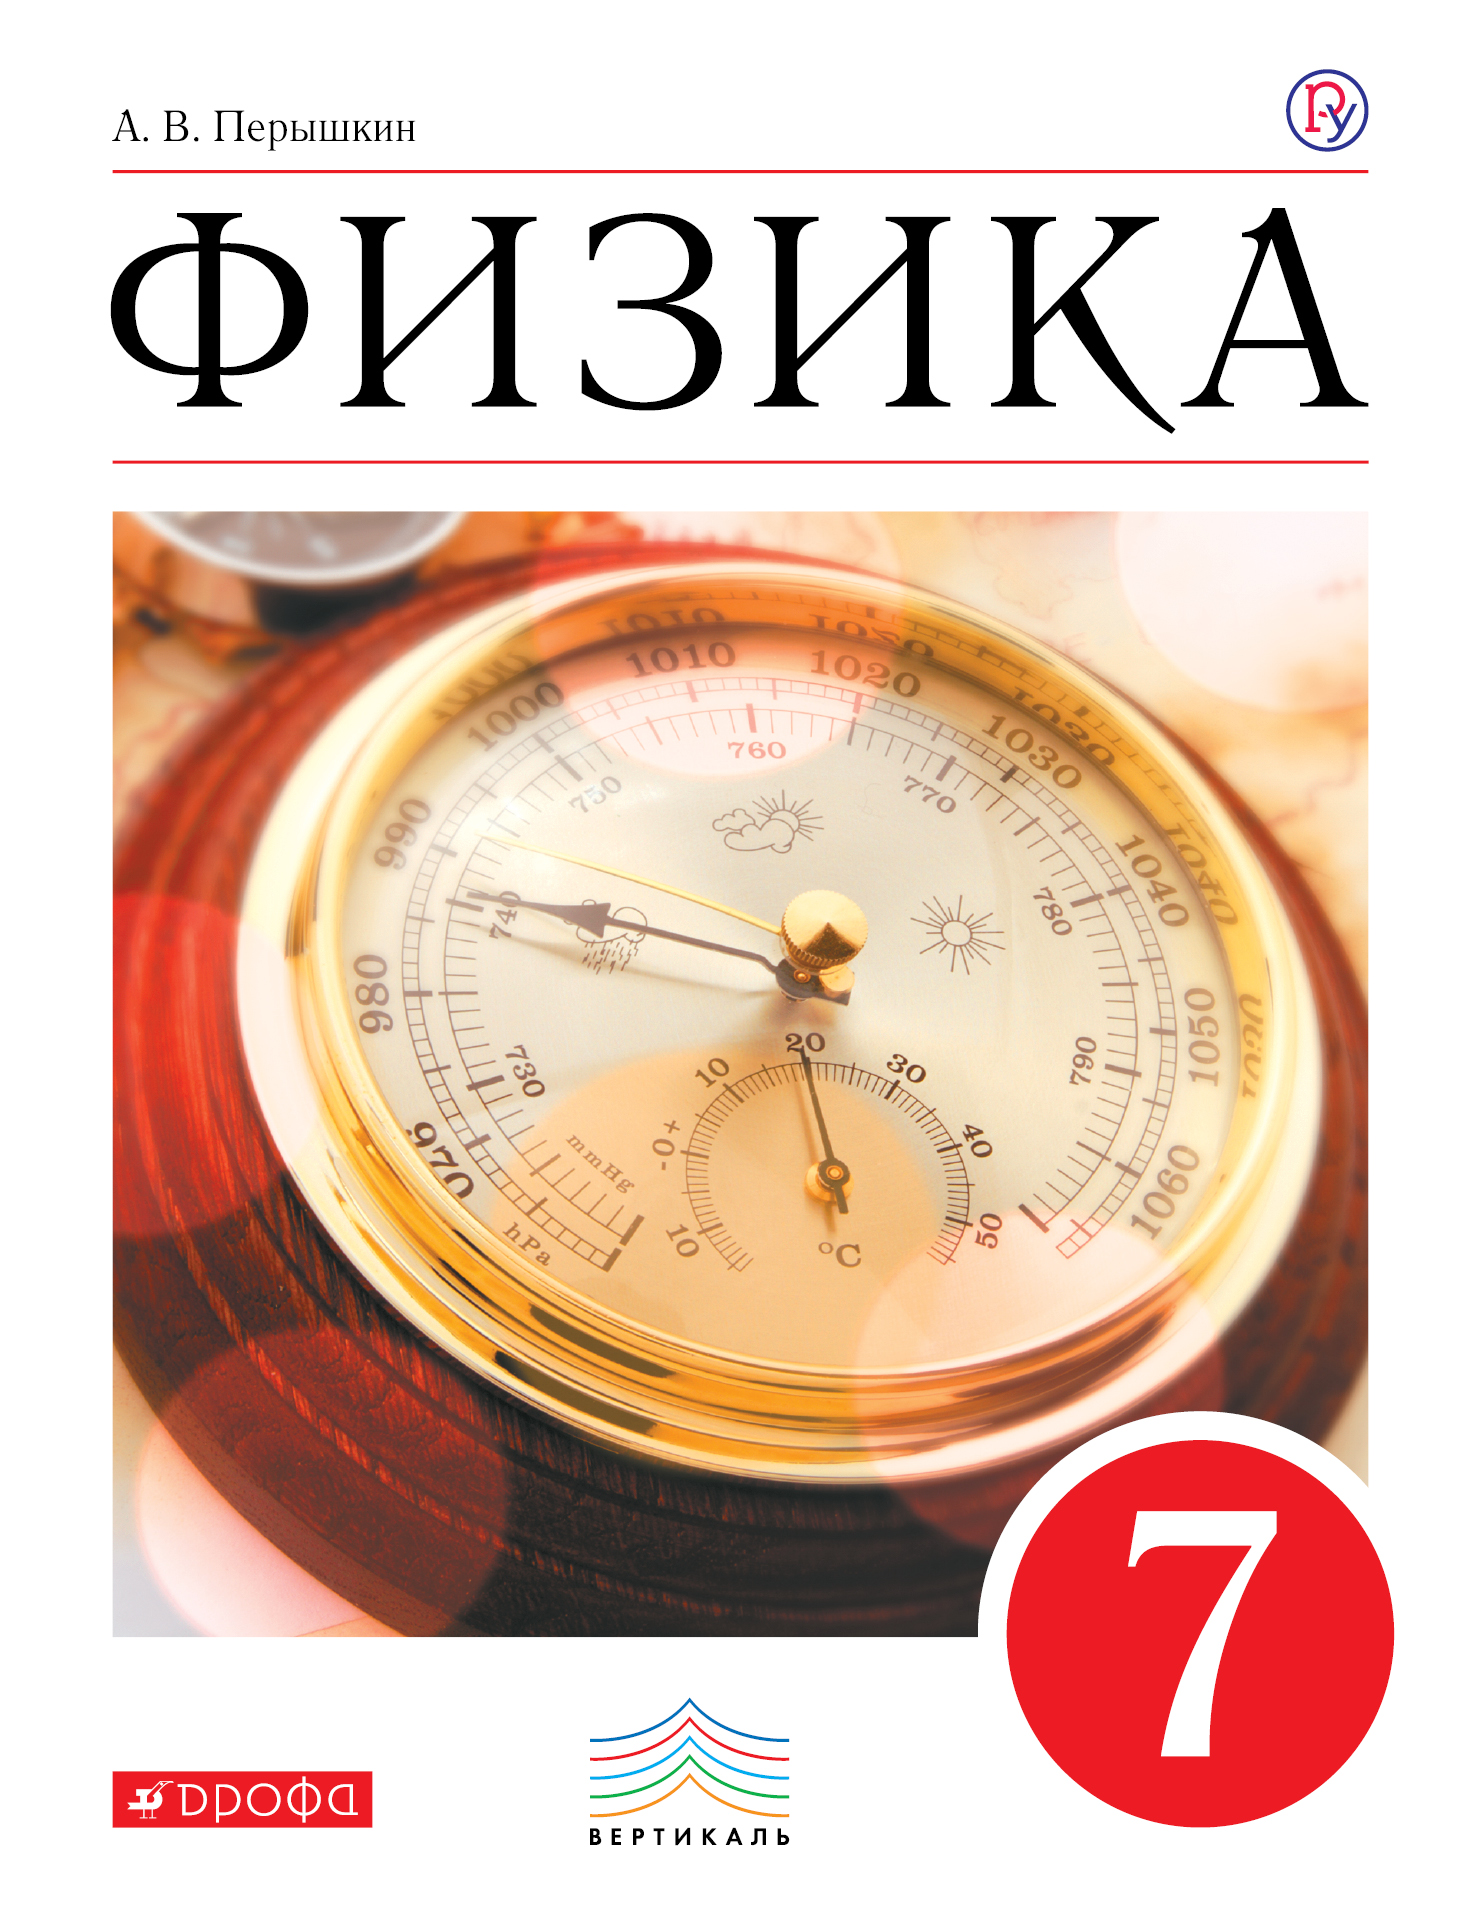 Перышкин А.В. Физика. 7 класс. Учебник. перышкин а в физика 7 кл учебник вертикаль isbn 978 5 358 19717 6